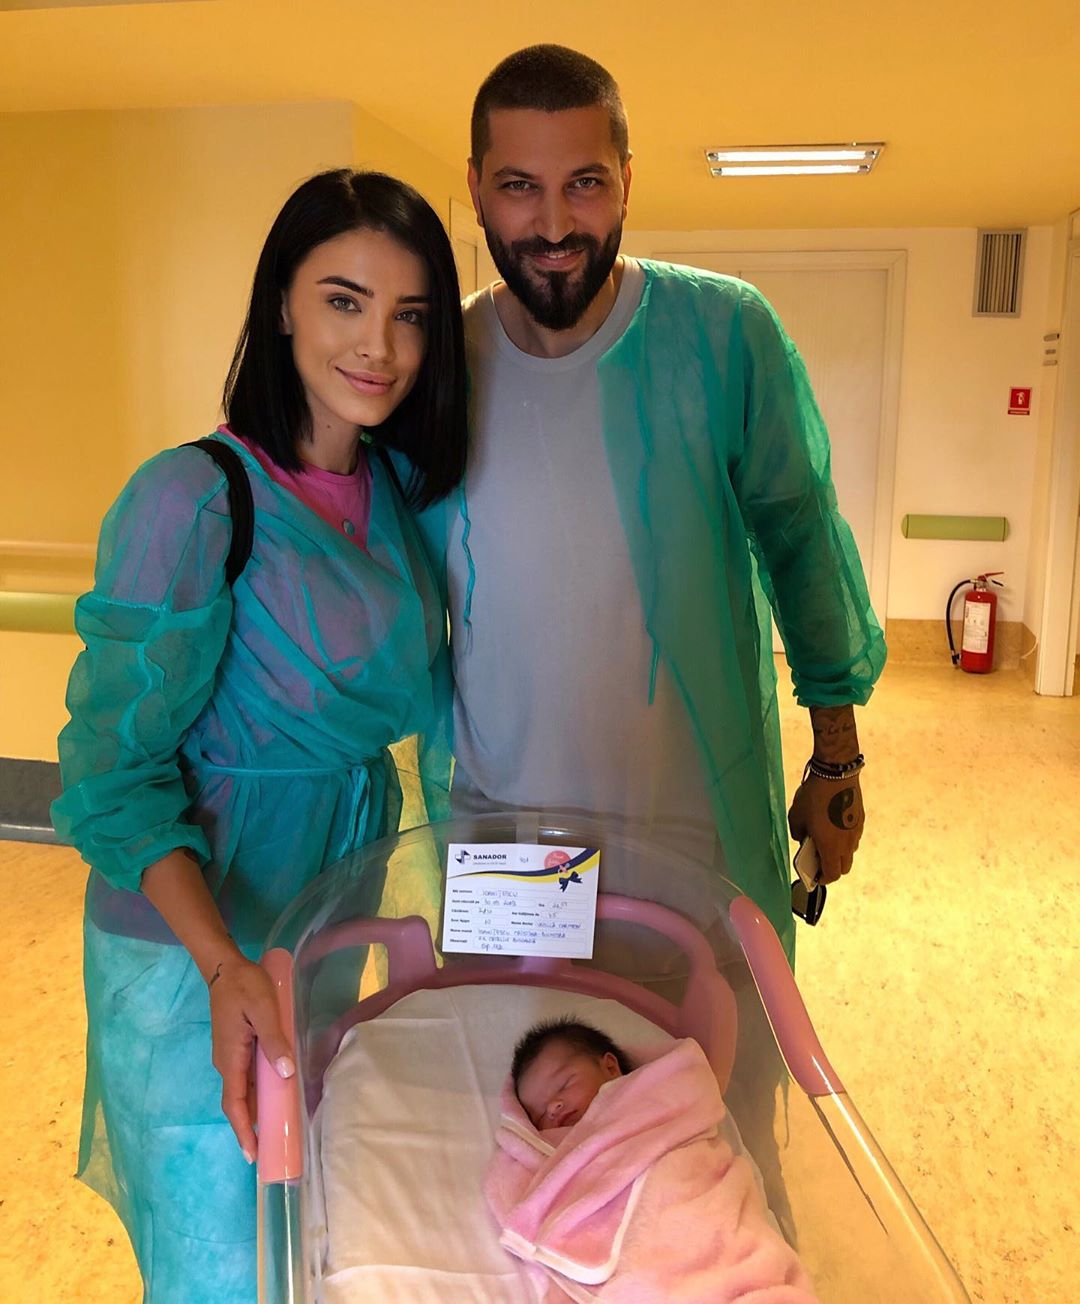 Vedeta a mai botezat doi copii: o fată și un băiat